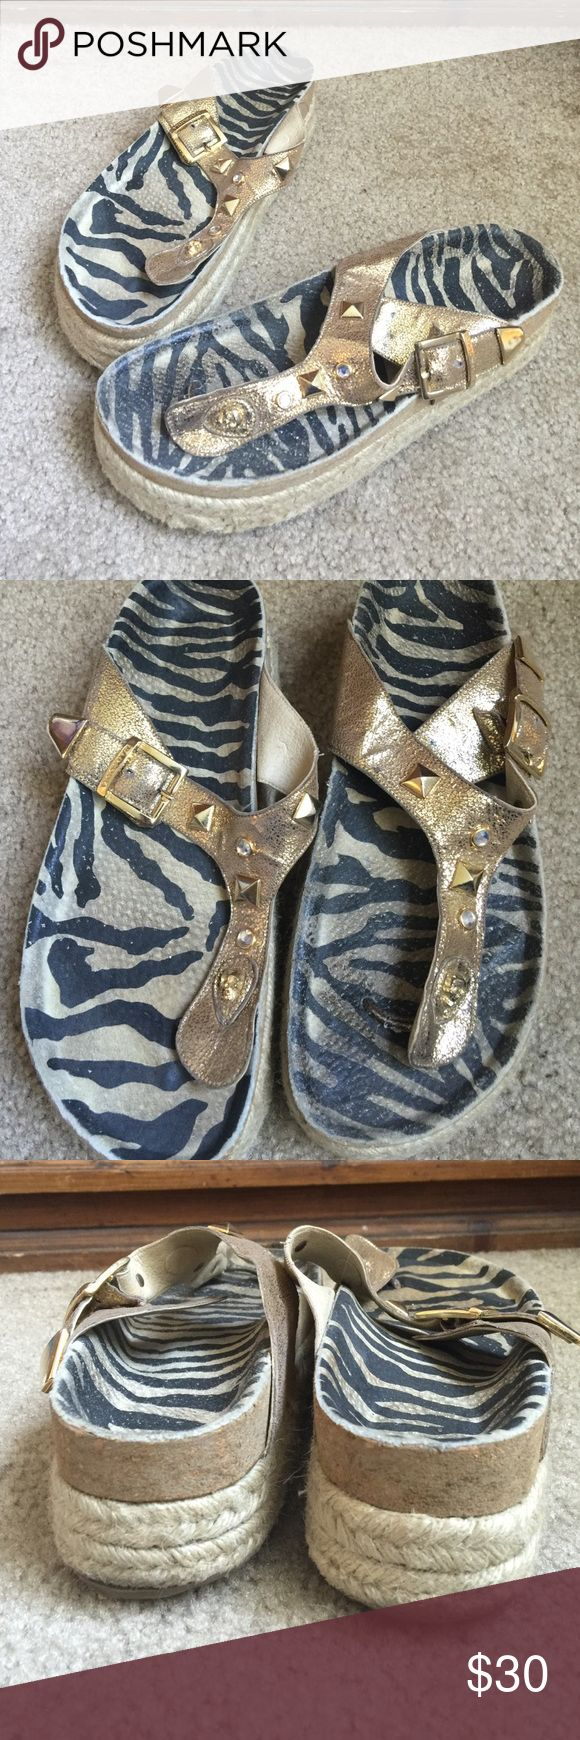 Rapsodia gold espadrilles Used condition. Gold with zebra print inside the sole. Gold embellishment. About 2' platform. Rapsodia Shoes Espadrilles